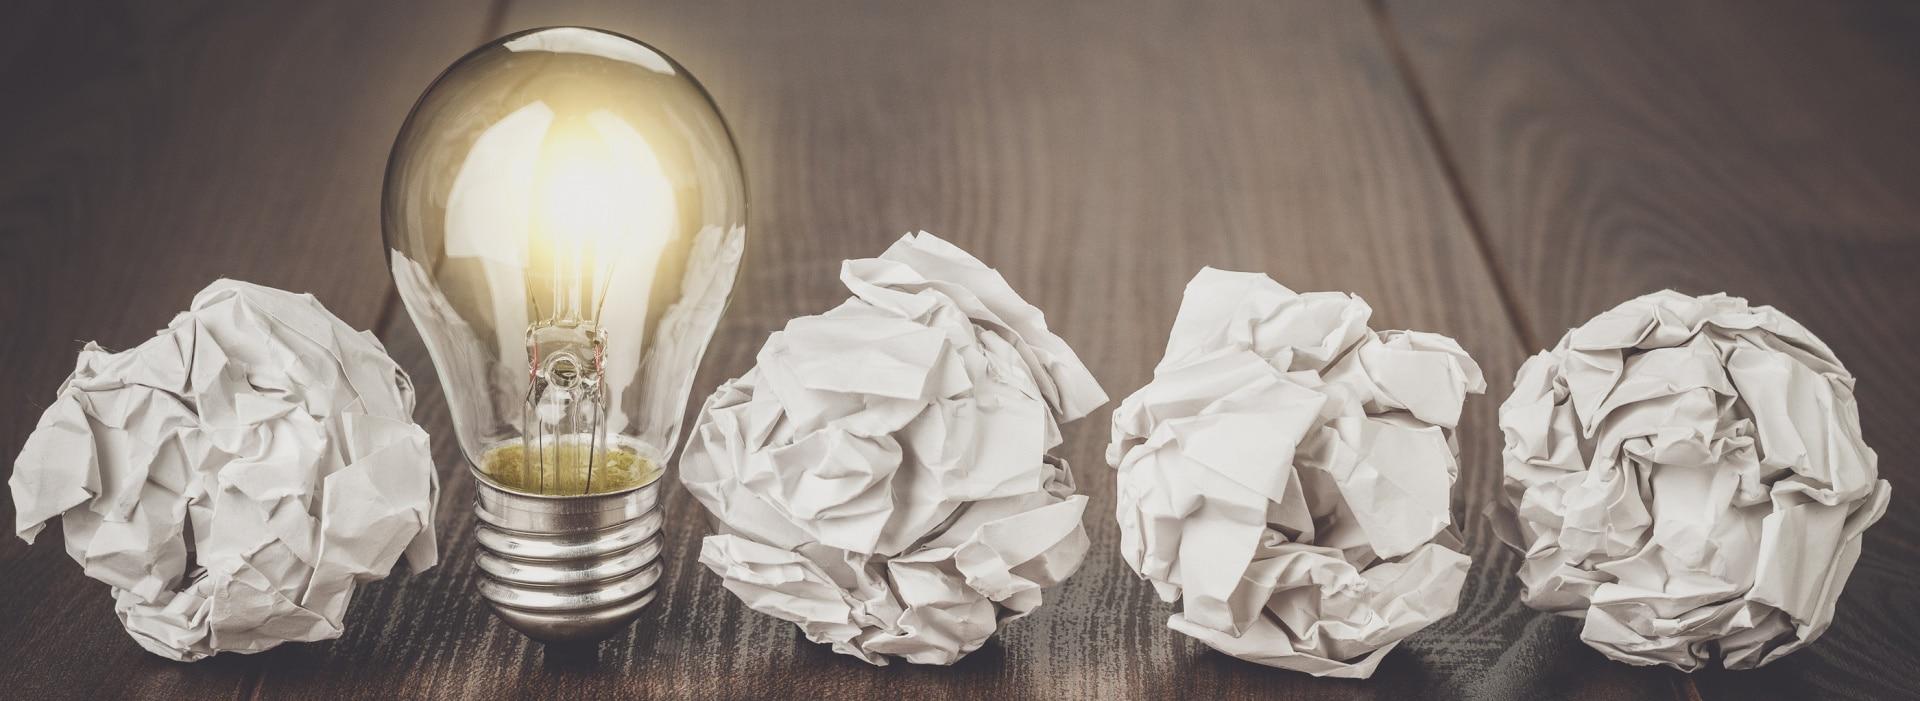 Use Plain Language for Financial Blogging